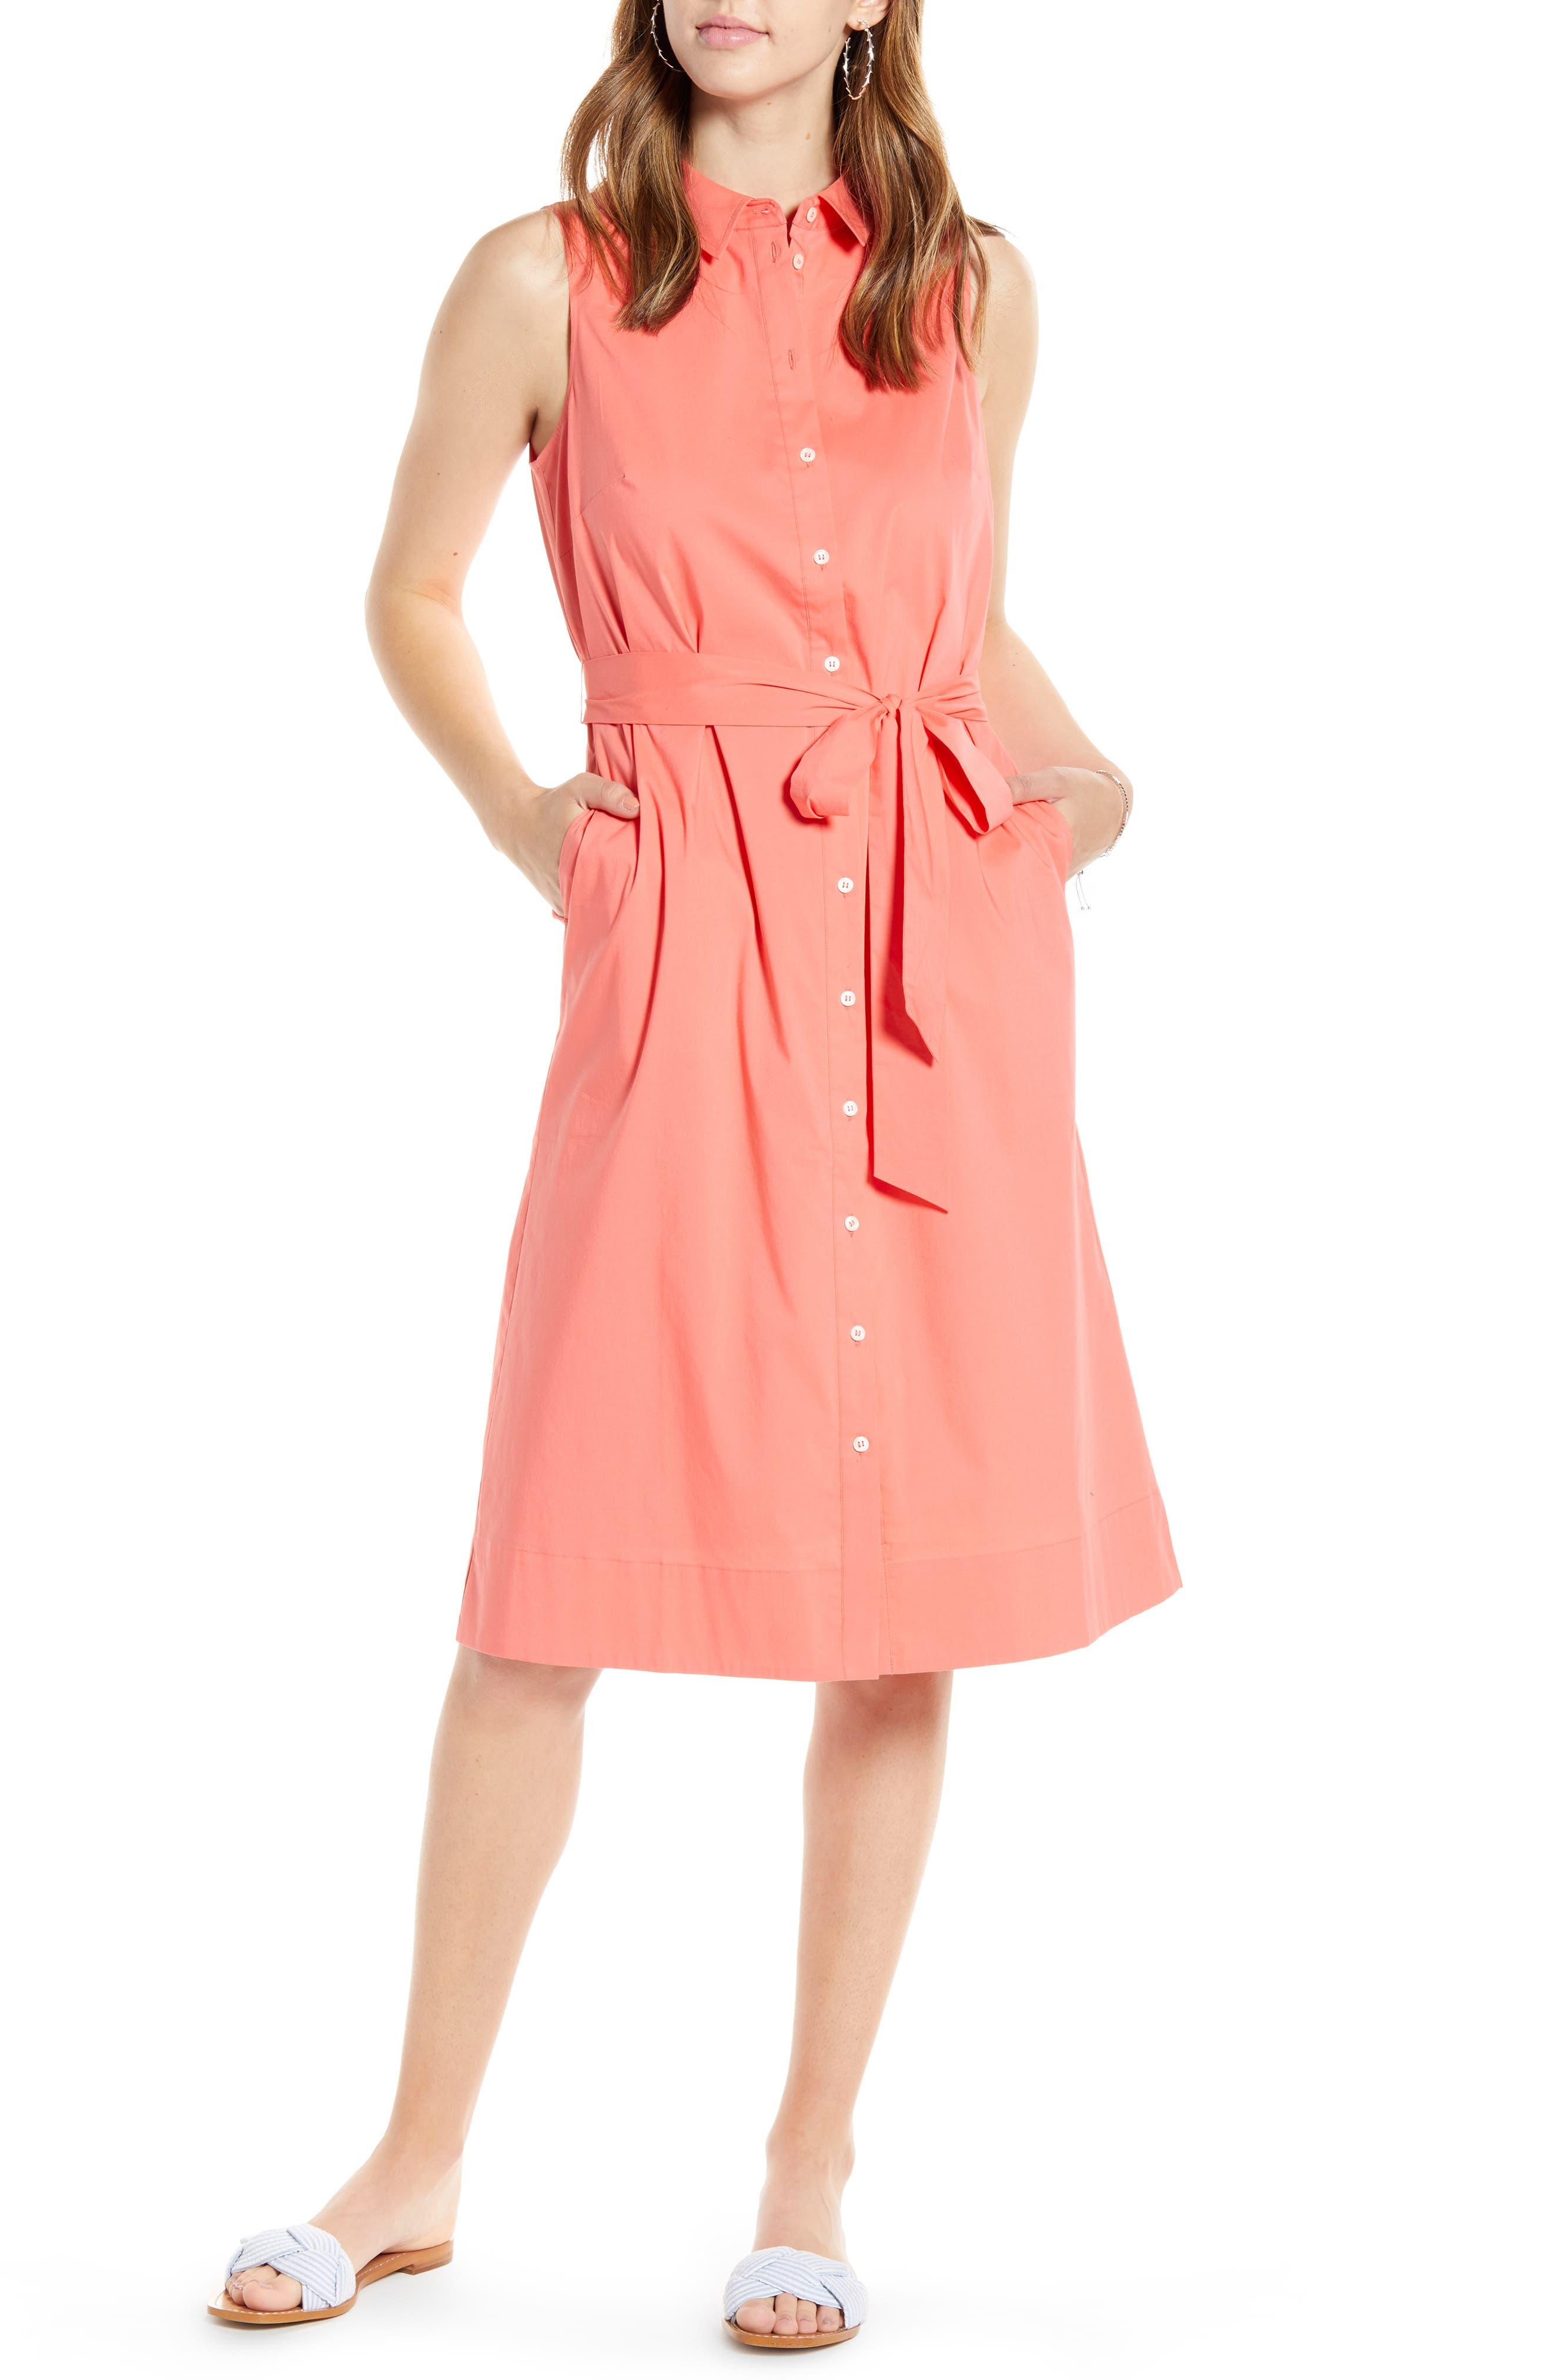 Petite 1901 Sleeveless Cotton Blend Shirtdress, Coral